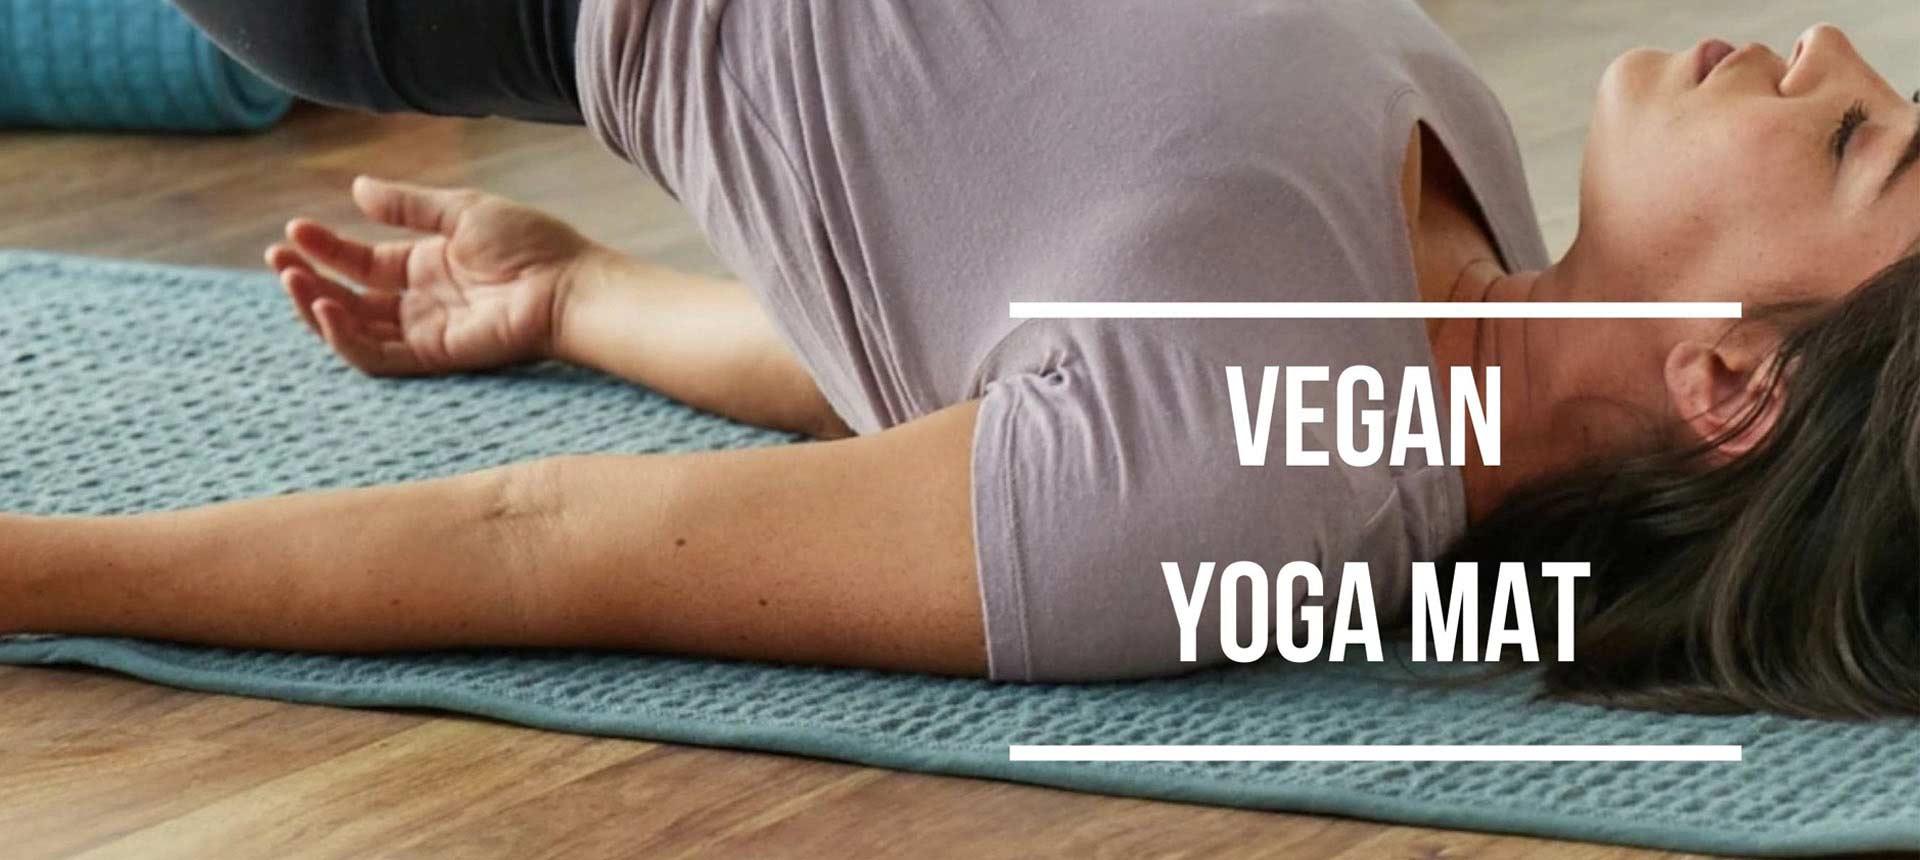 Best Vegan Yoga Mat